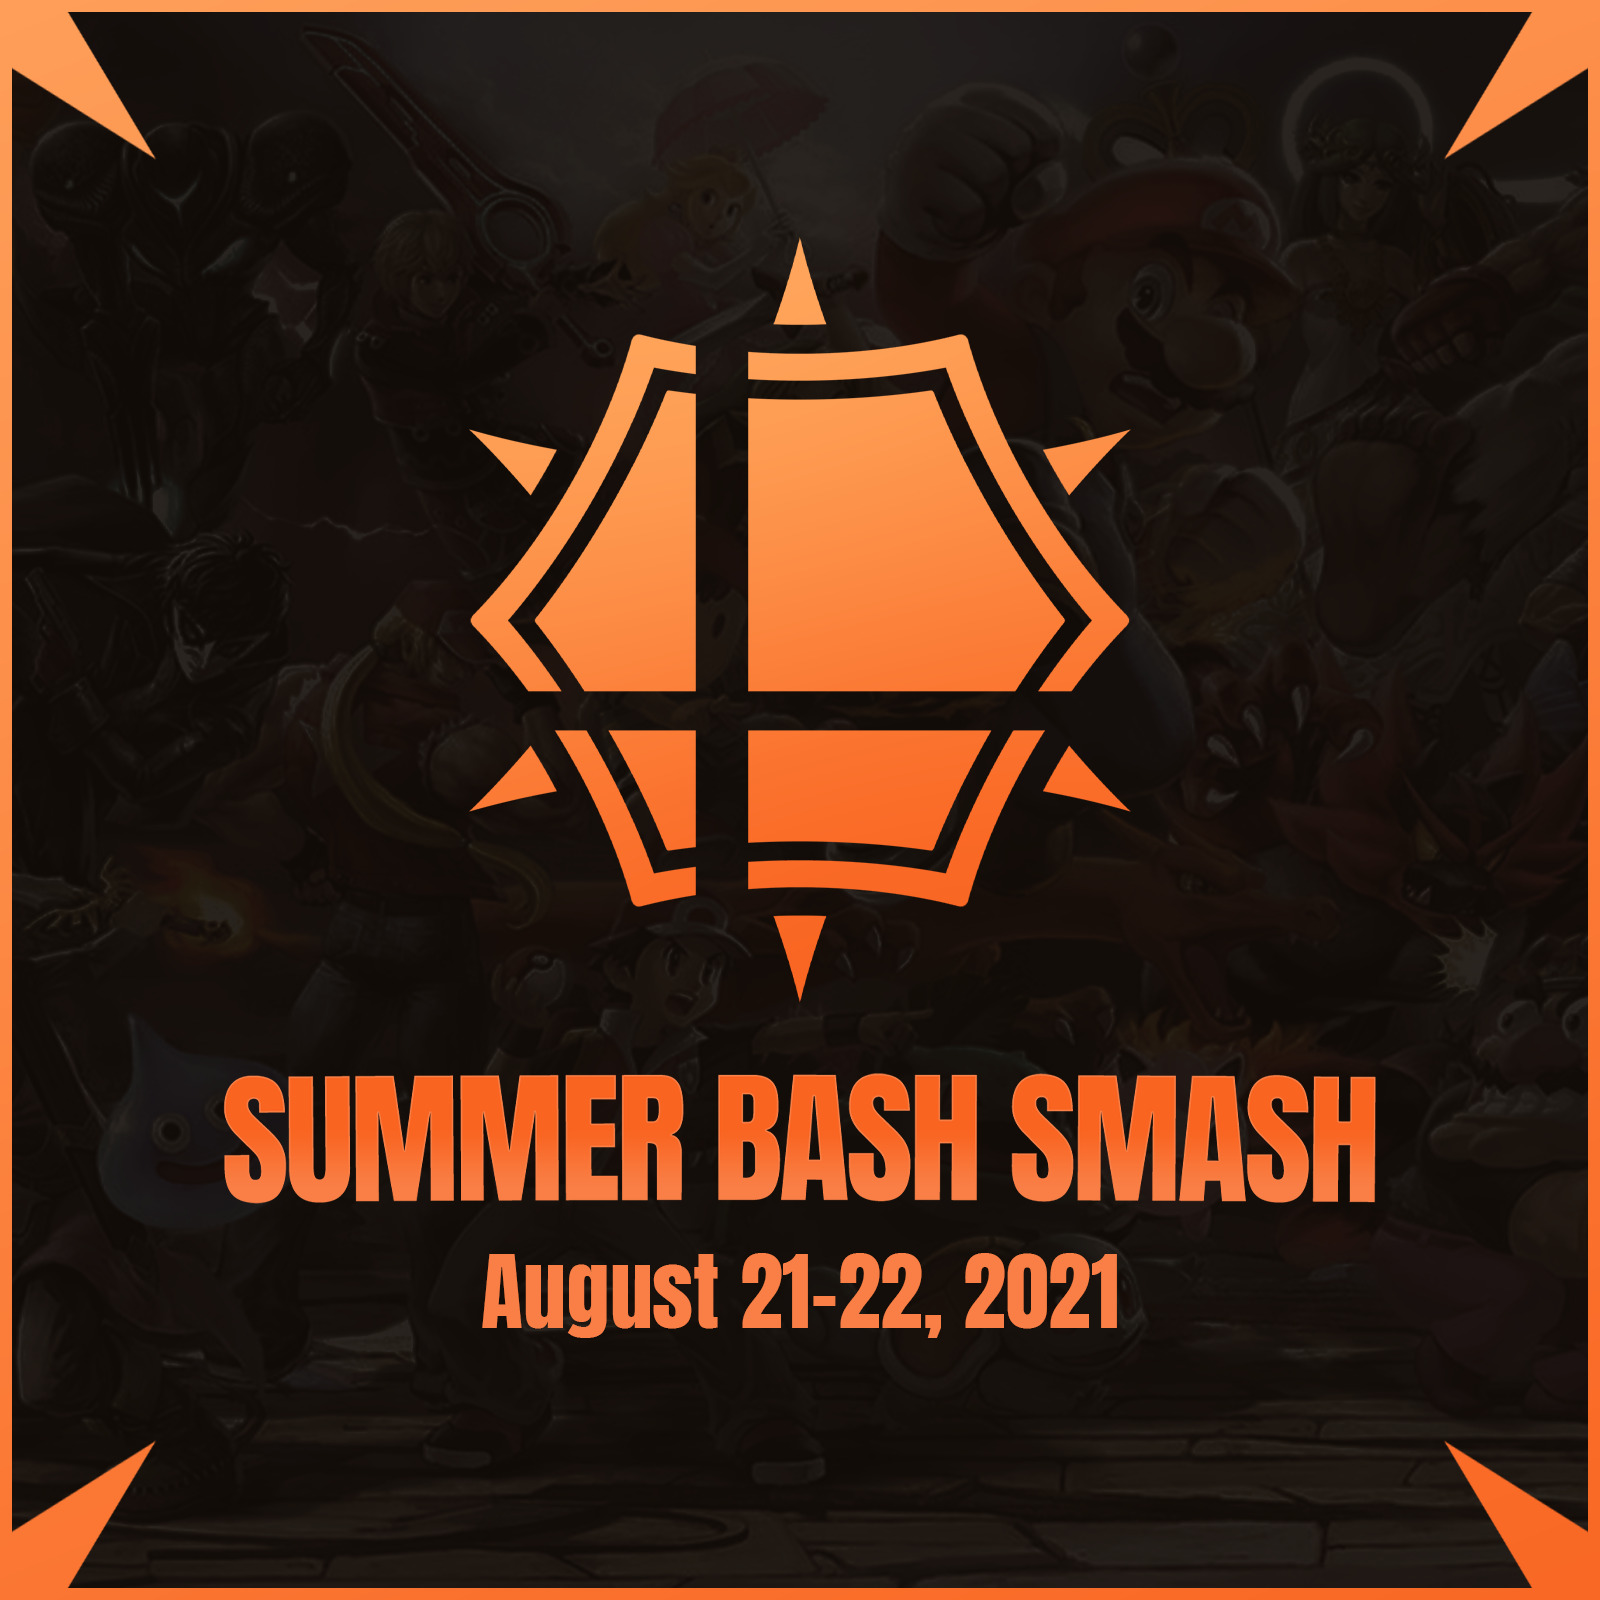 Summer Bash Smash